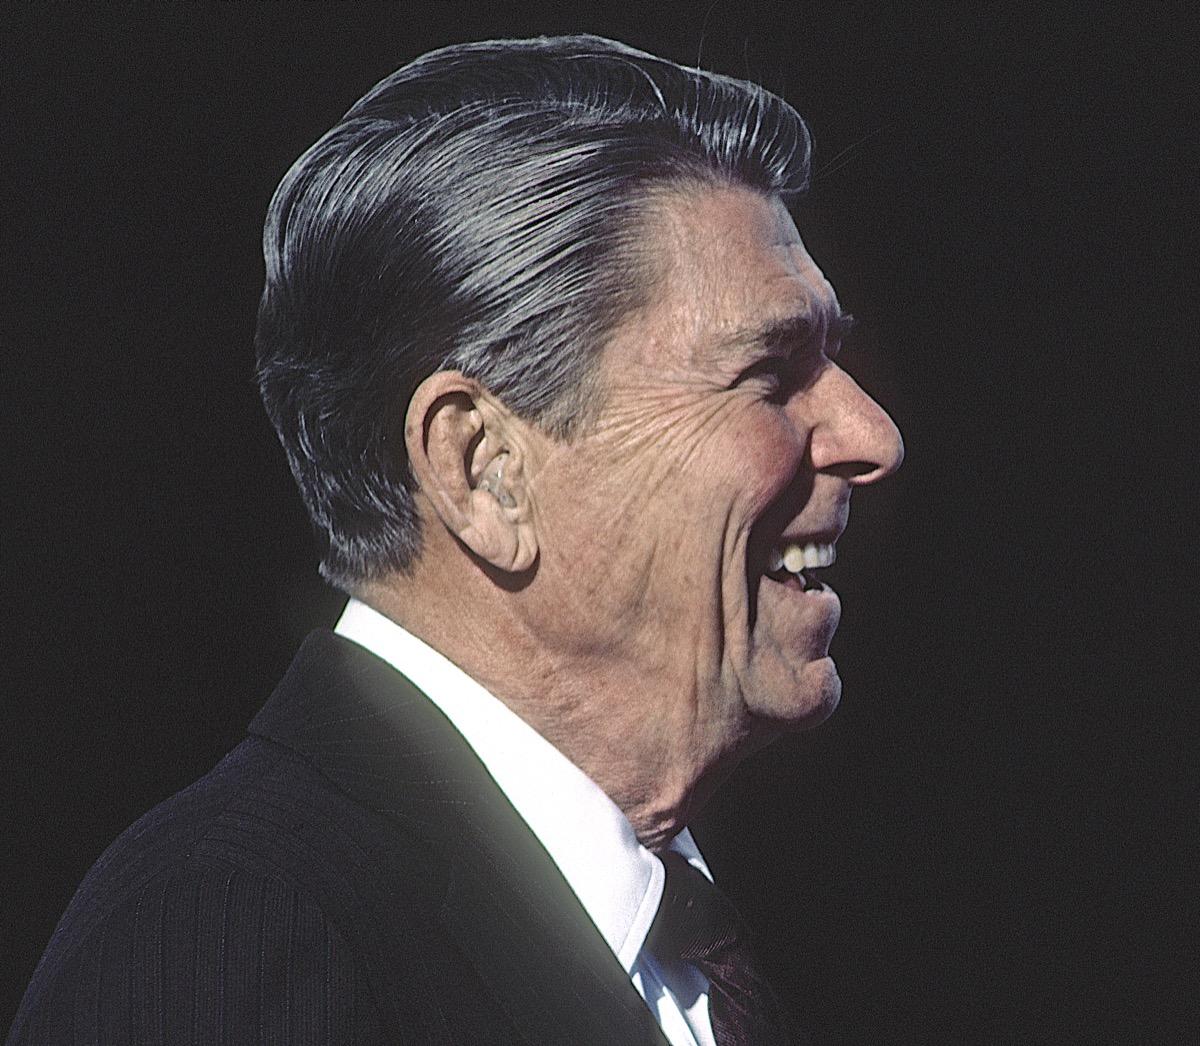 Ronald Reagan wearing hearing aids